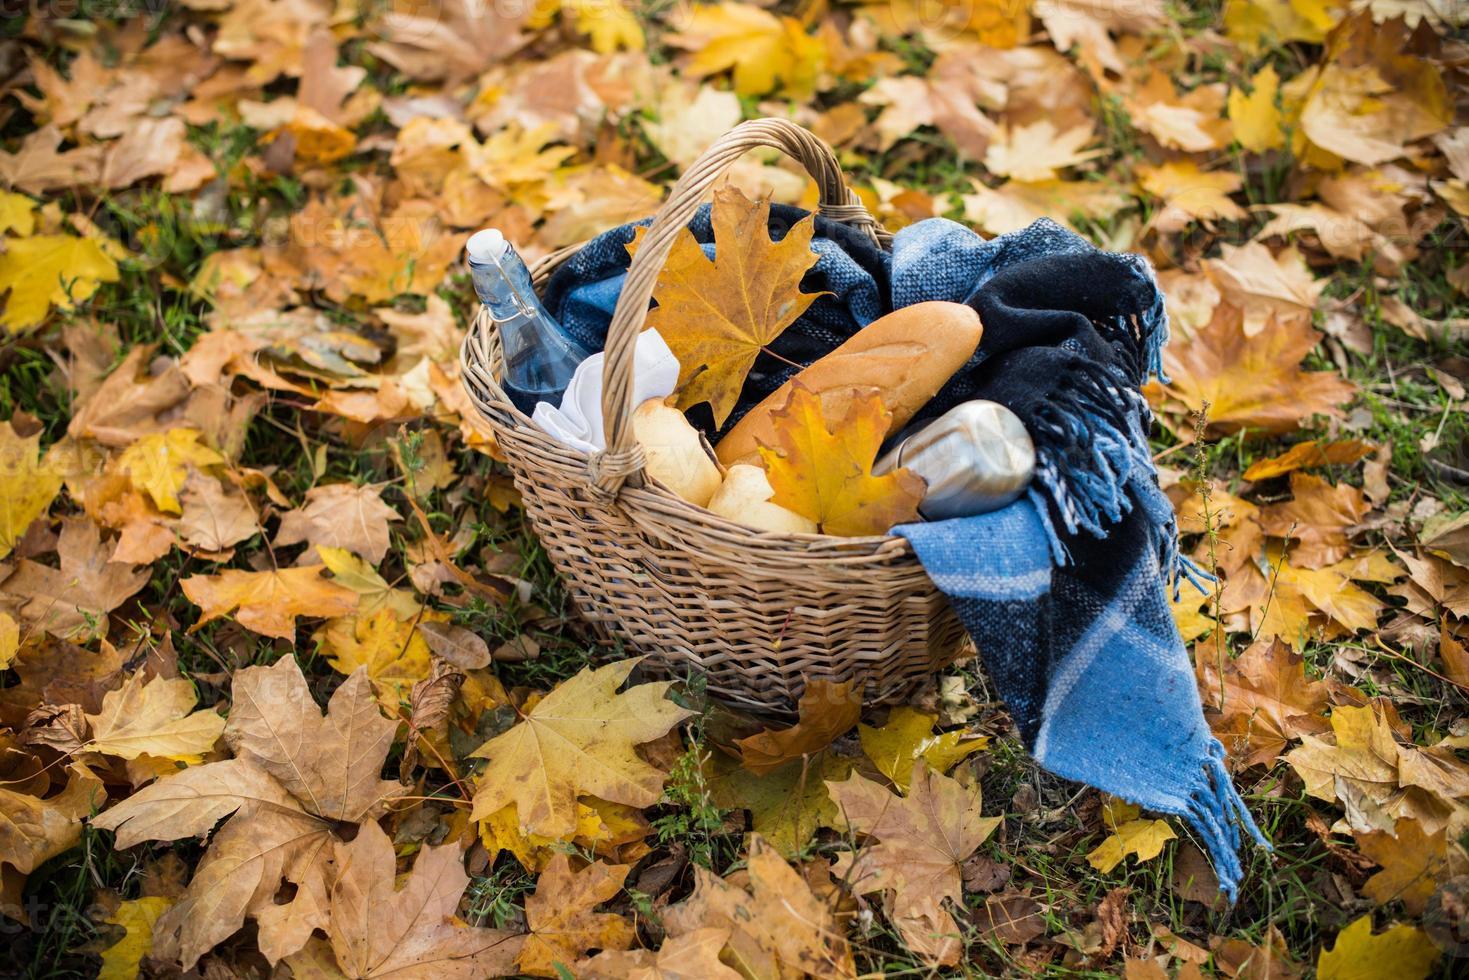 Autumn picnic in park photo